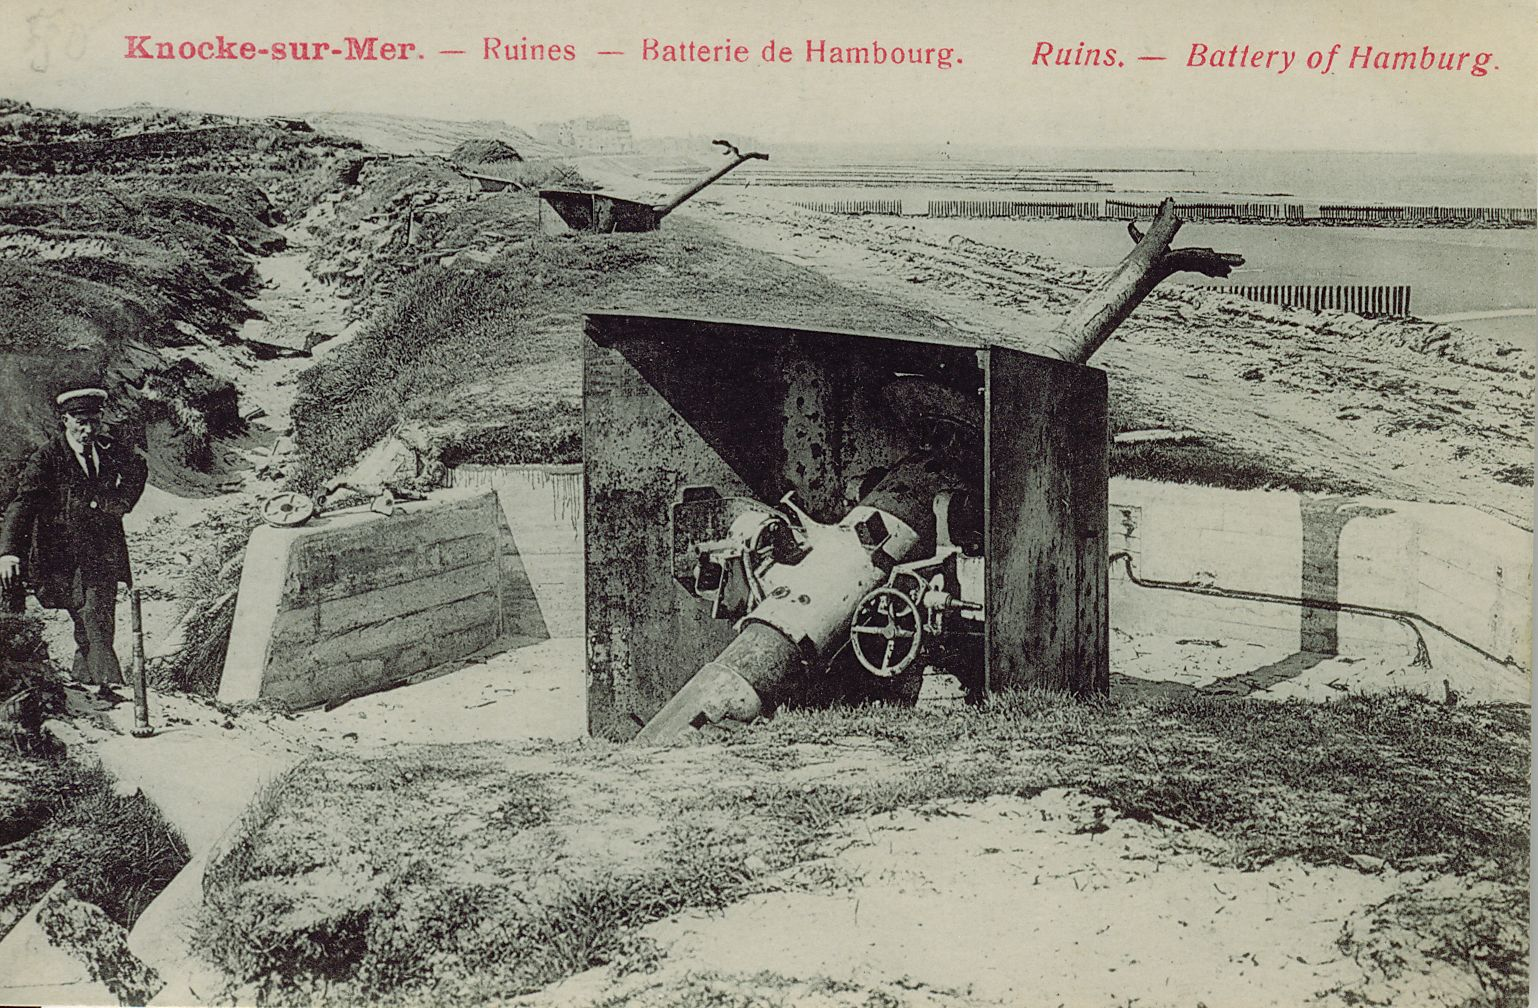 Knokke_BatterijHamburg